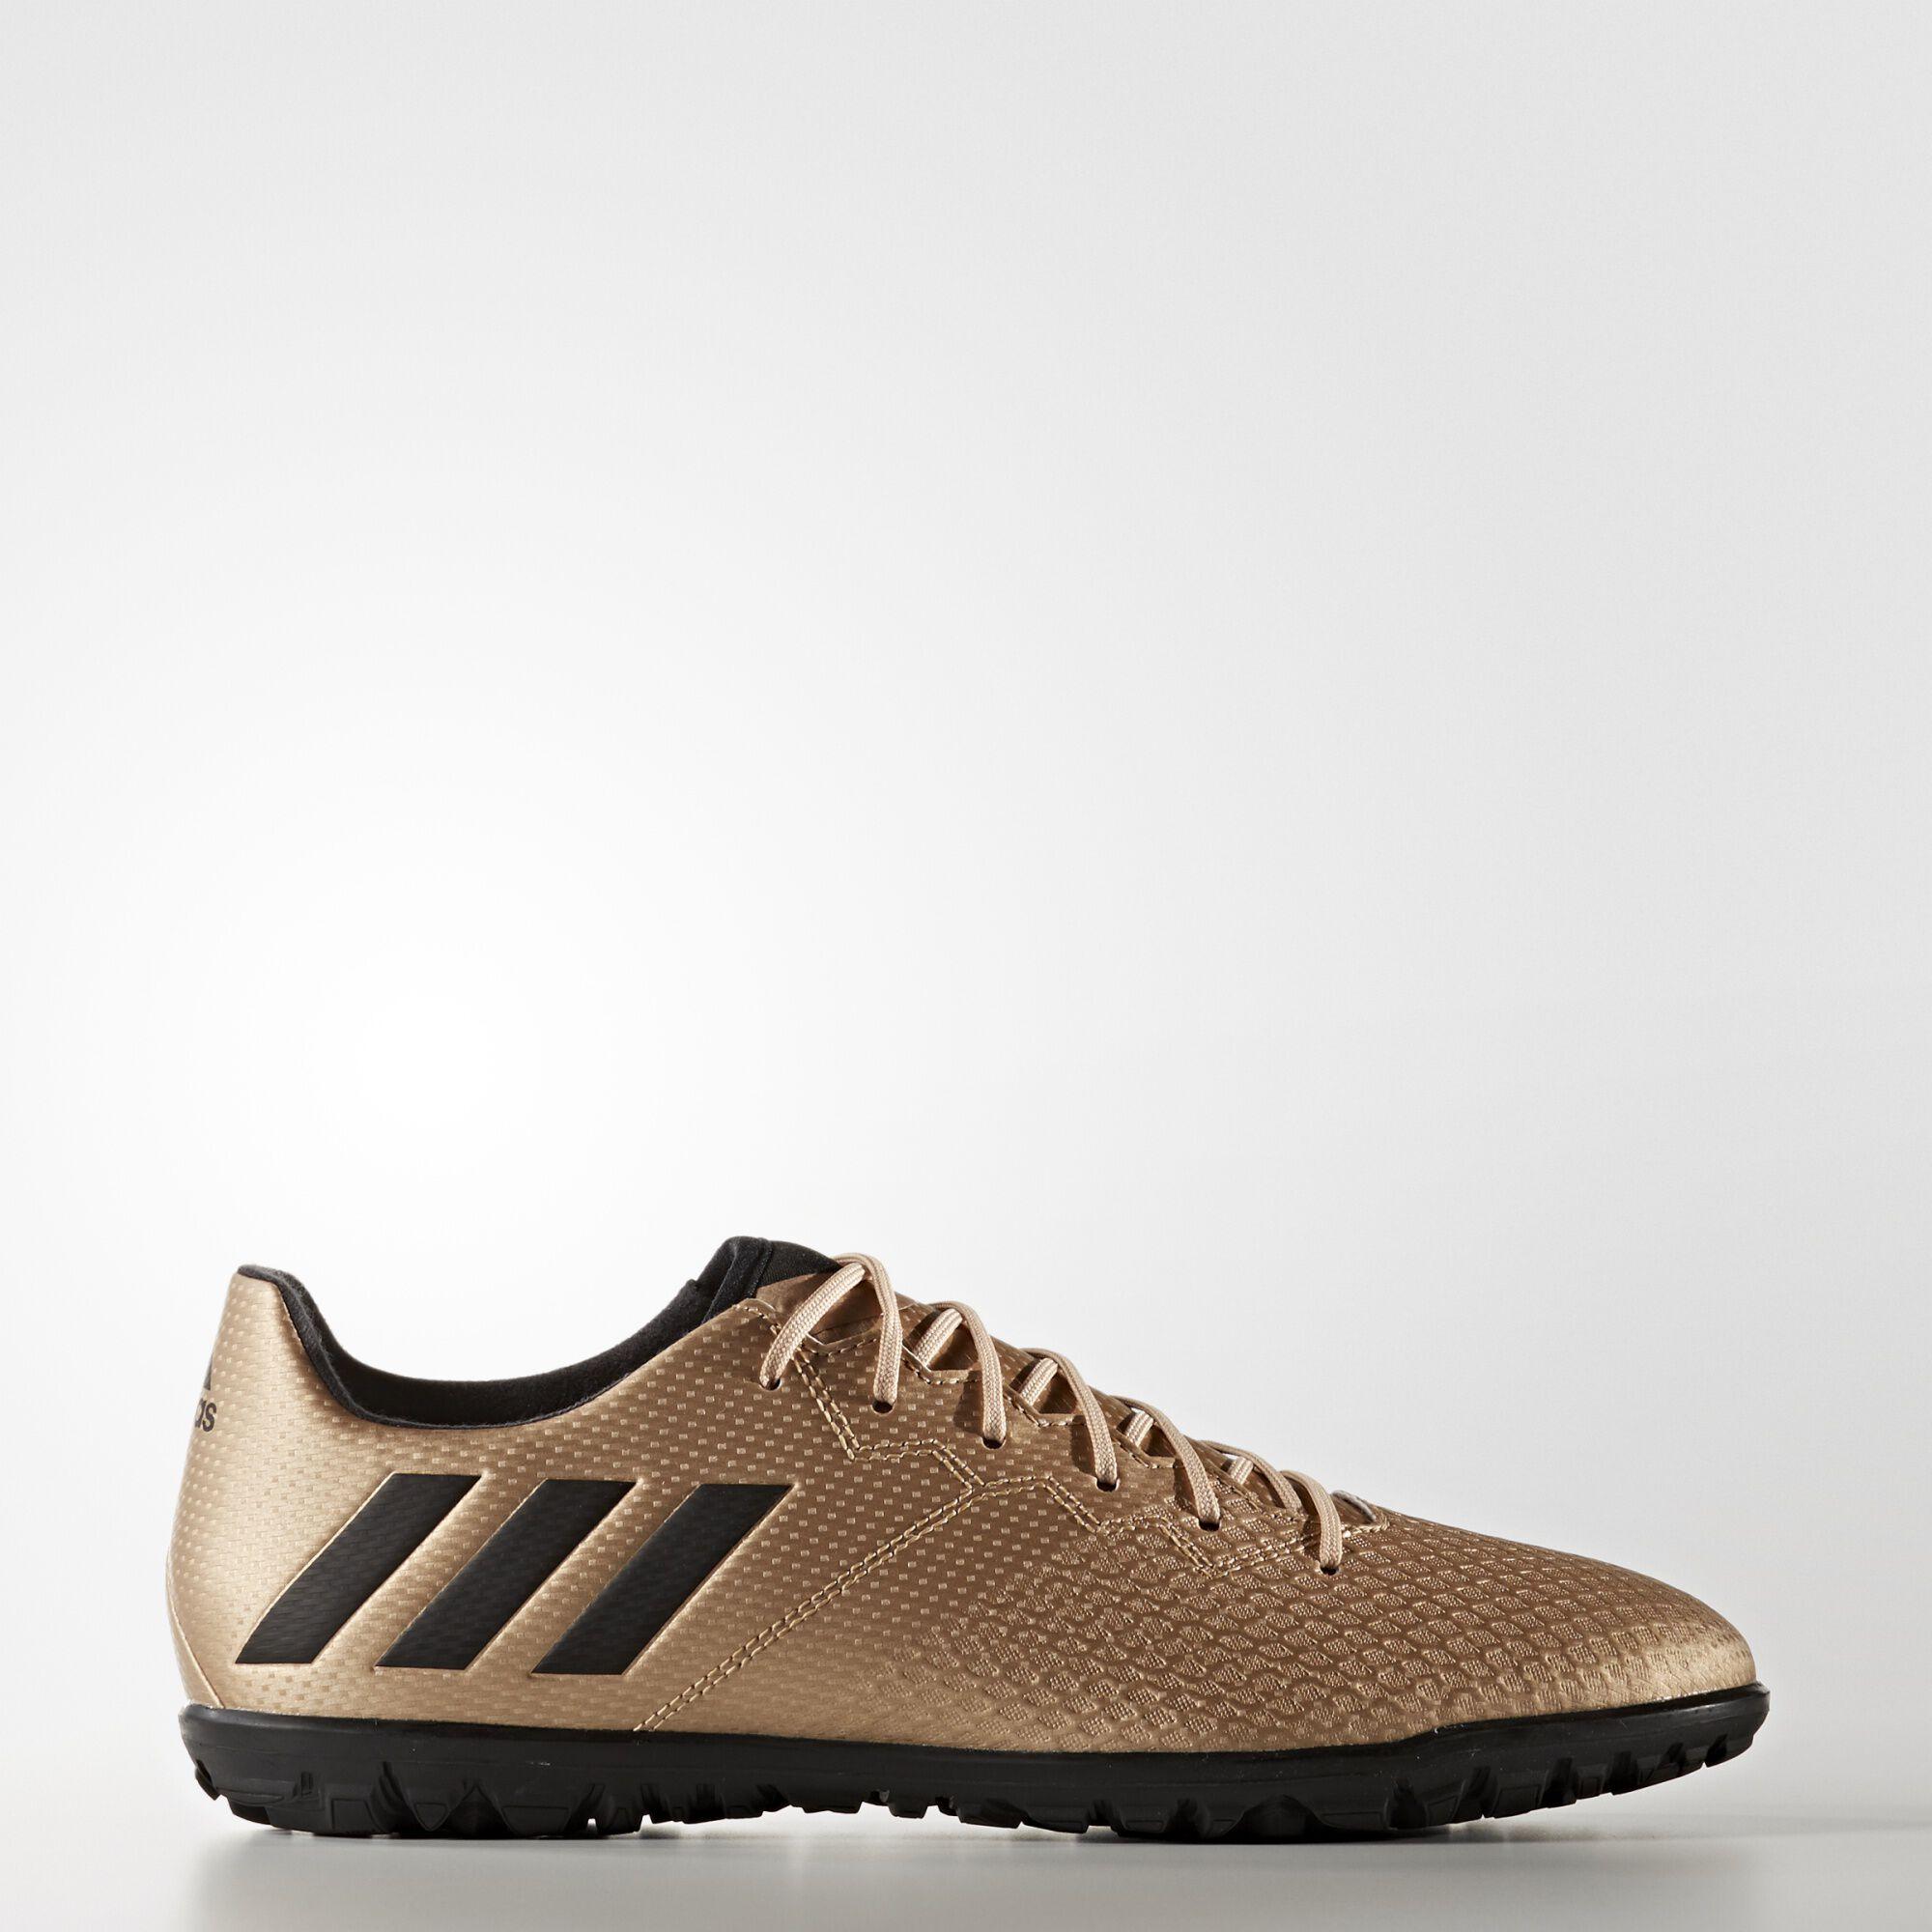 adidas Messi 16.3 Turf Shoes - Gold | adidas US